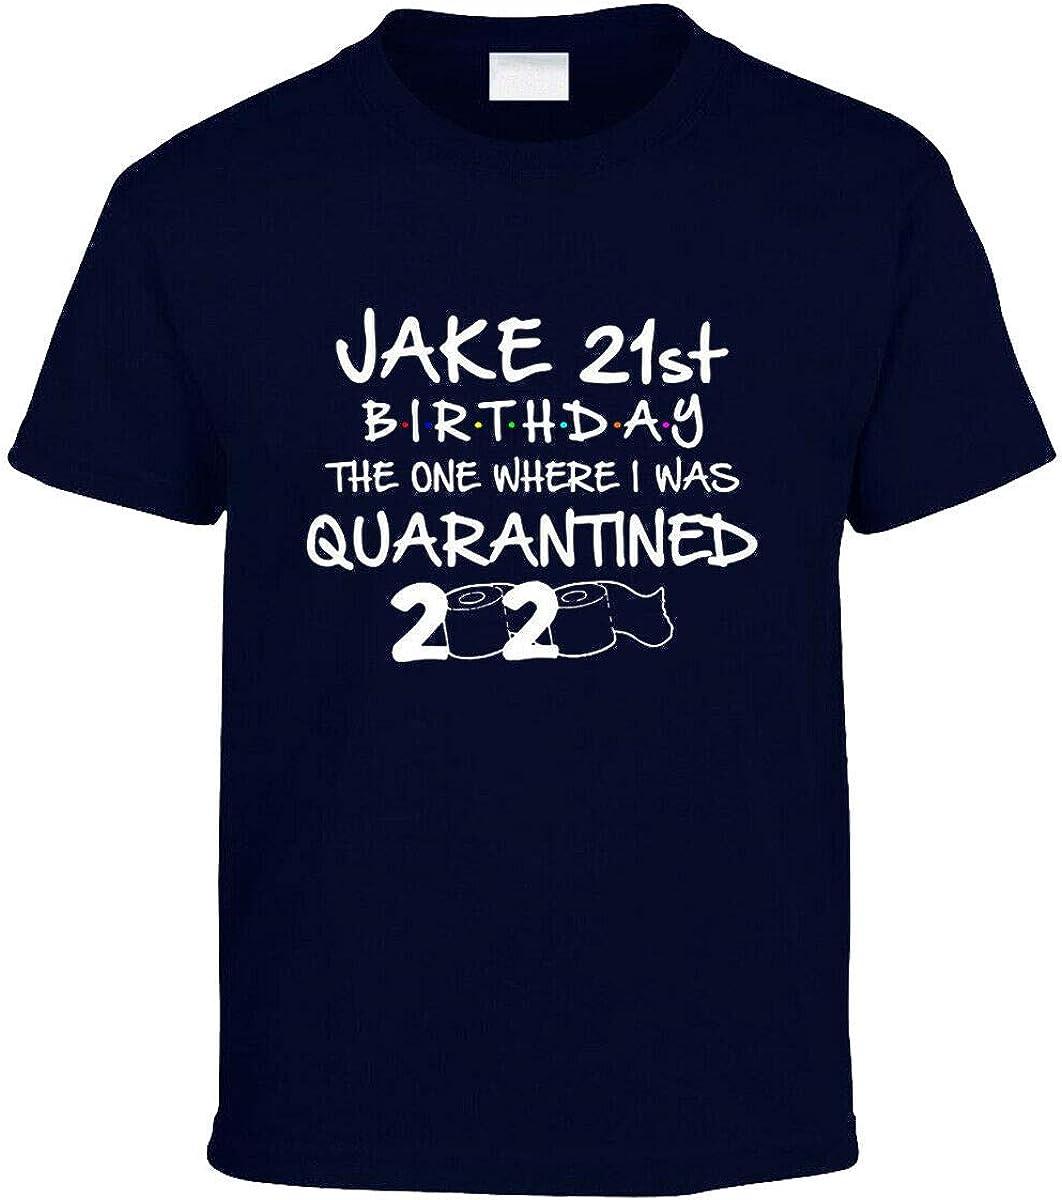 Amo Distro Social Distancing Kids Tshirt Personalised Name Birthday Quarantine Class of 2020 Unisex Boys//Girls